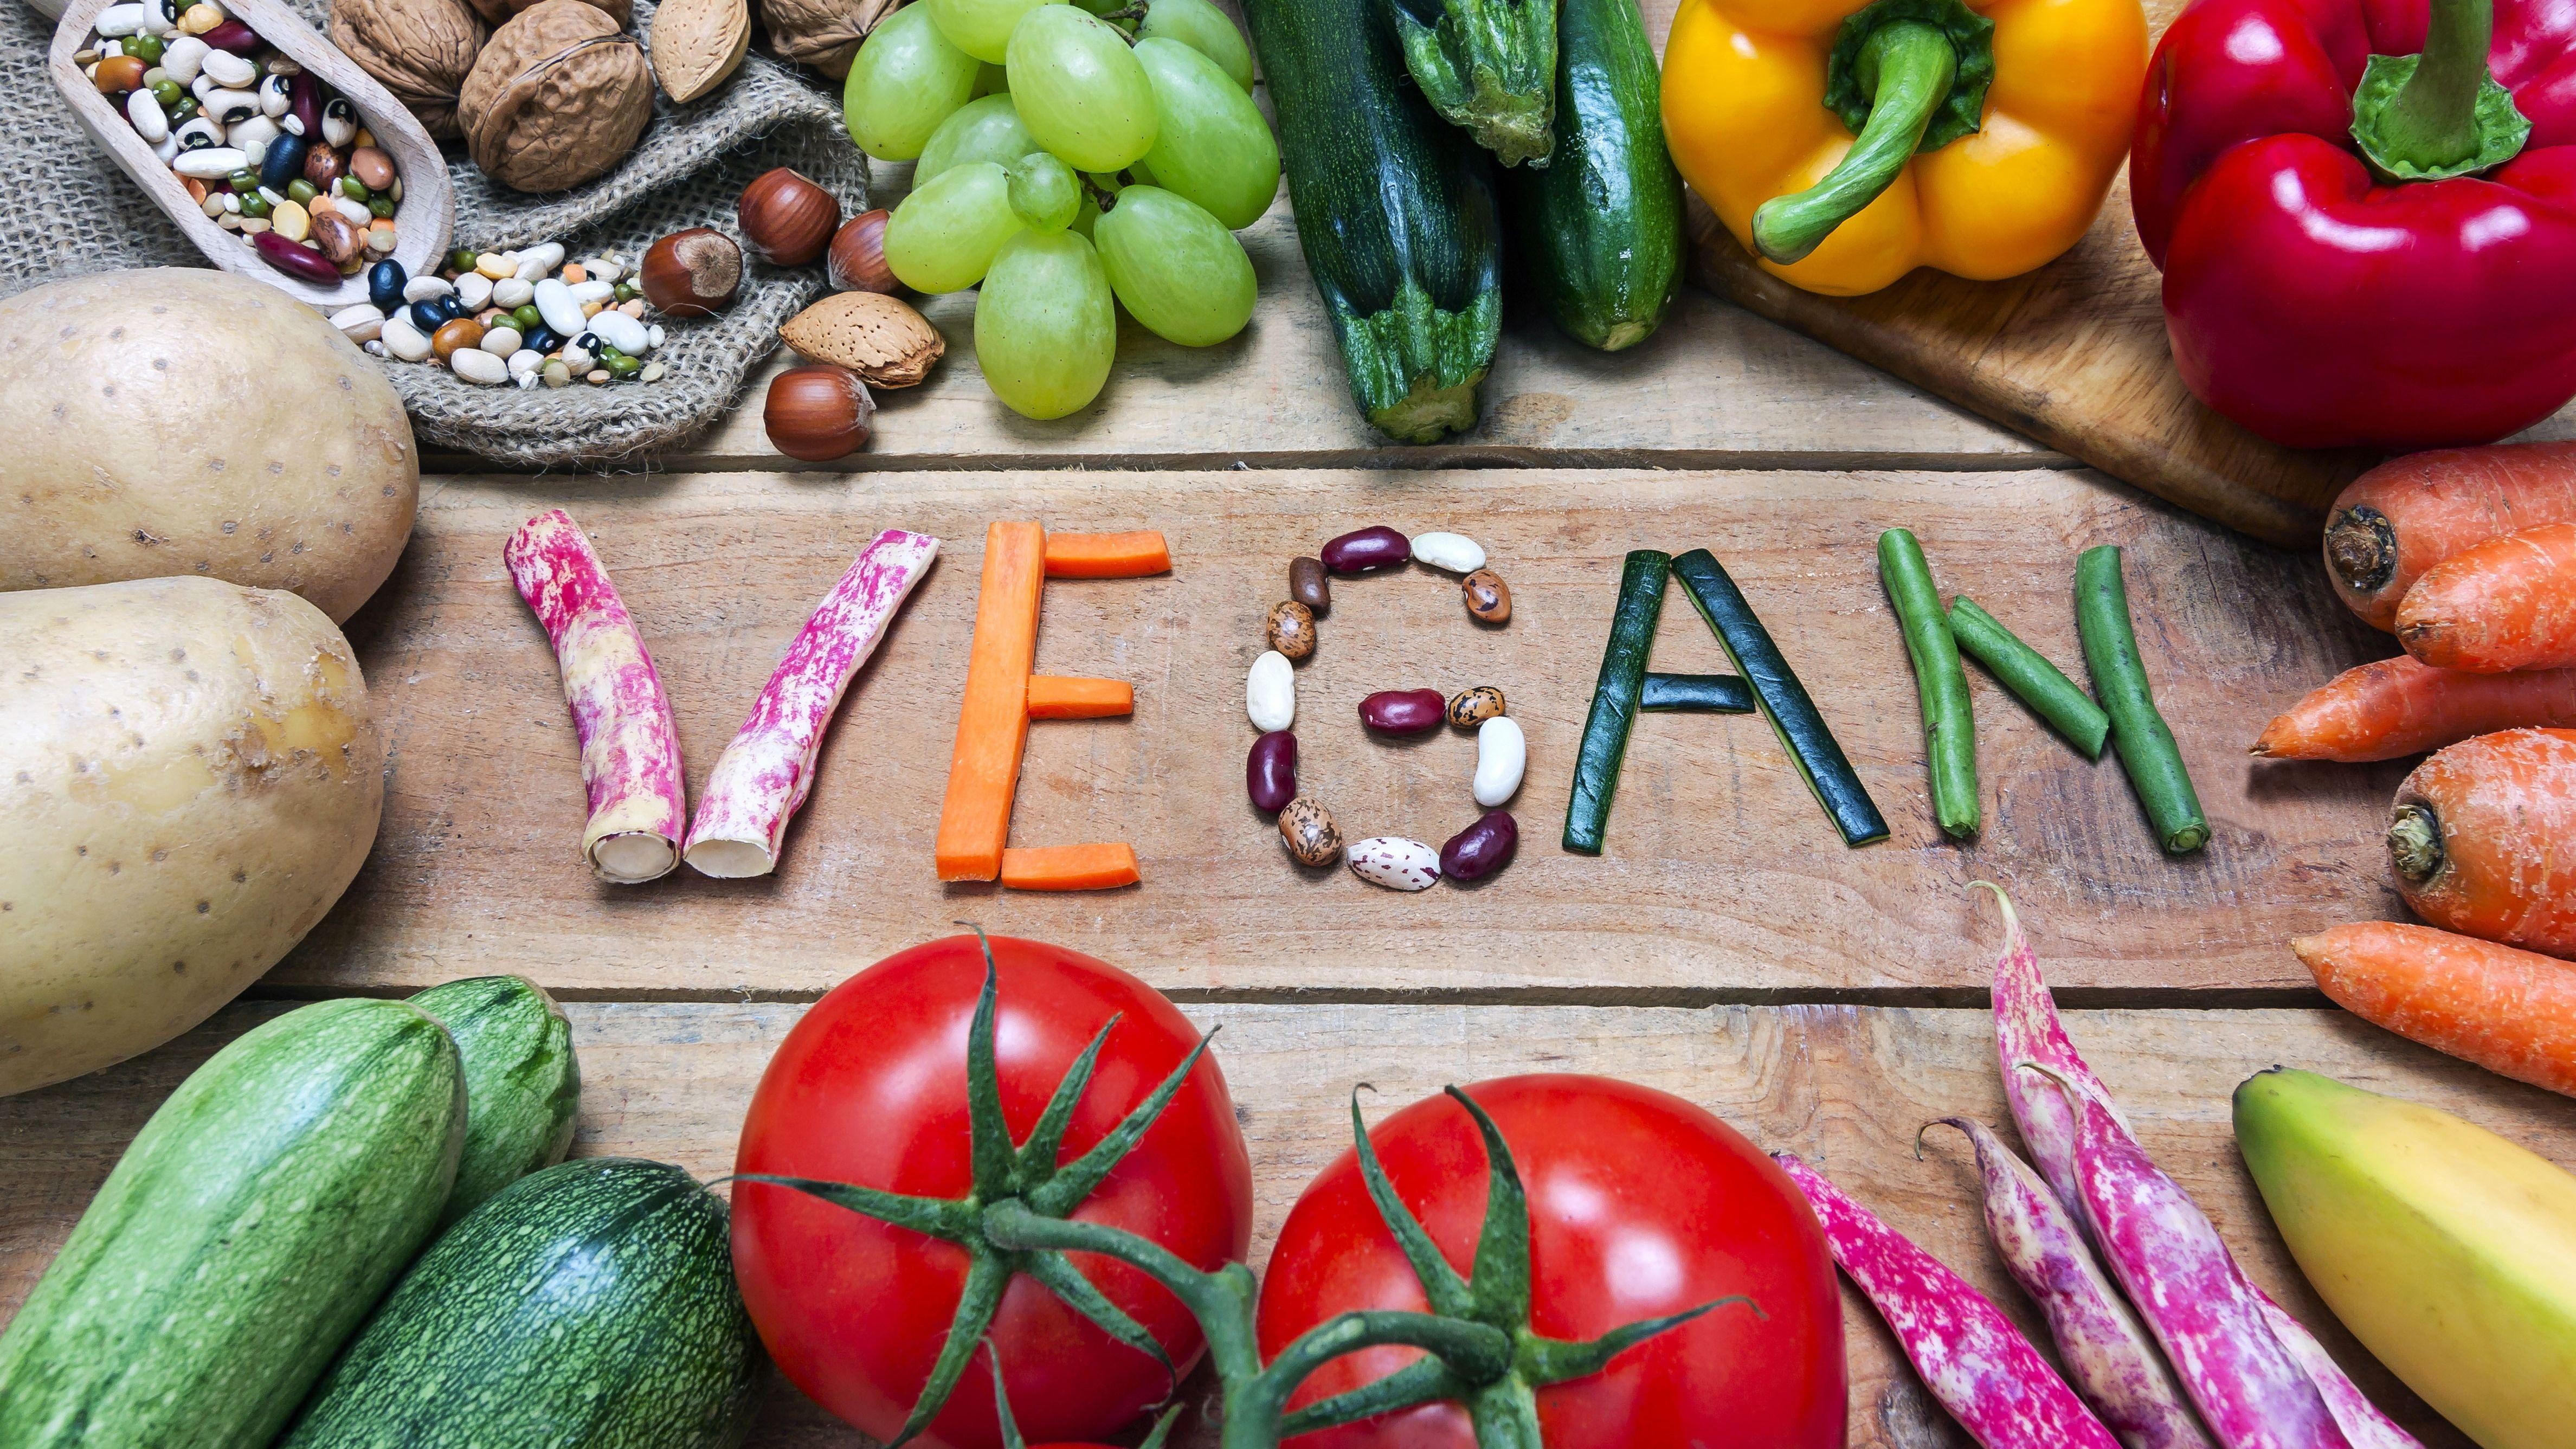 Plats vegans